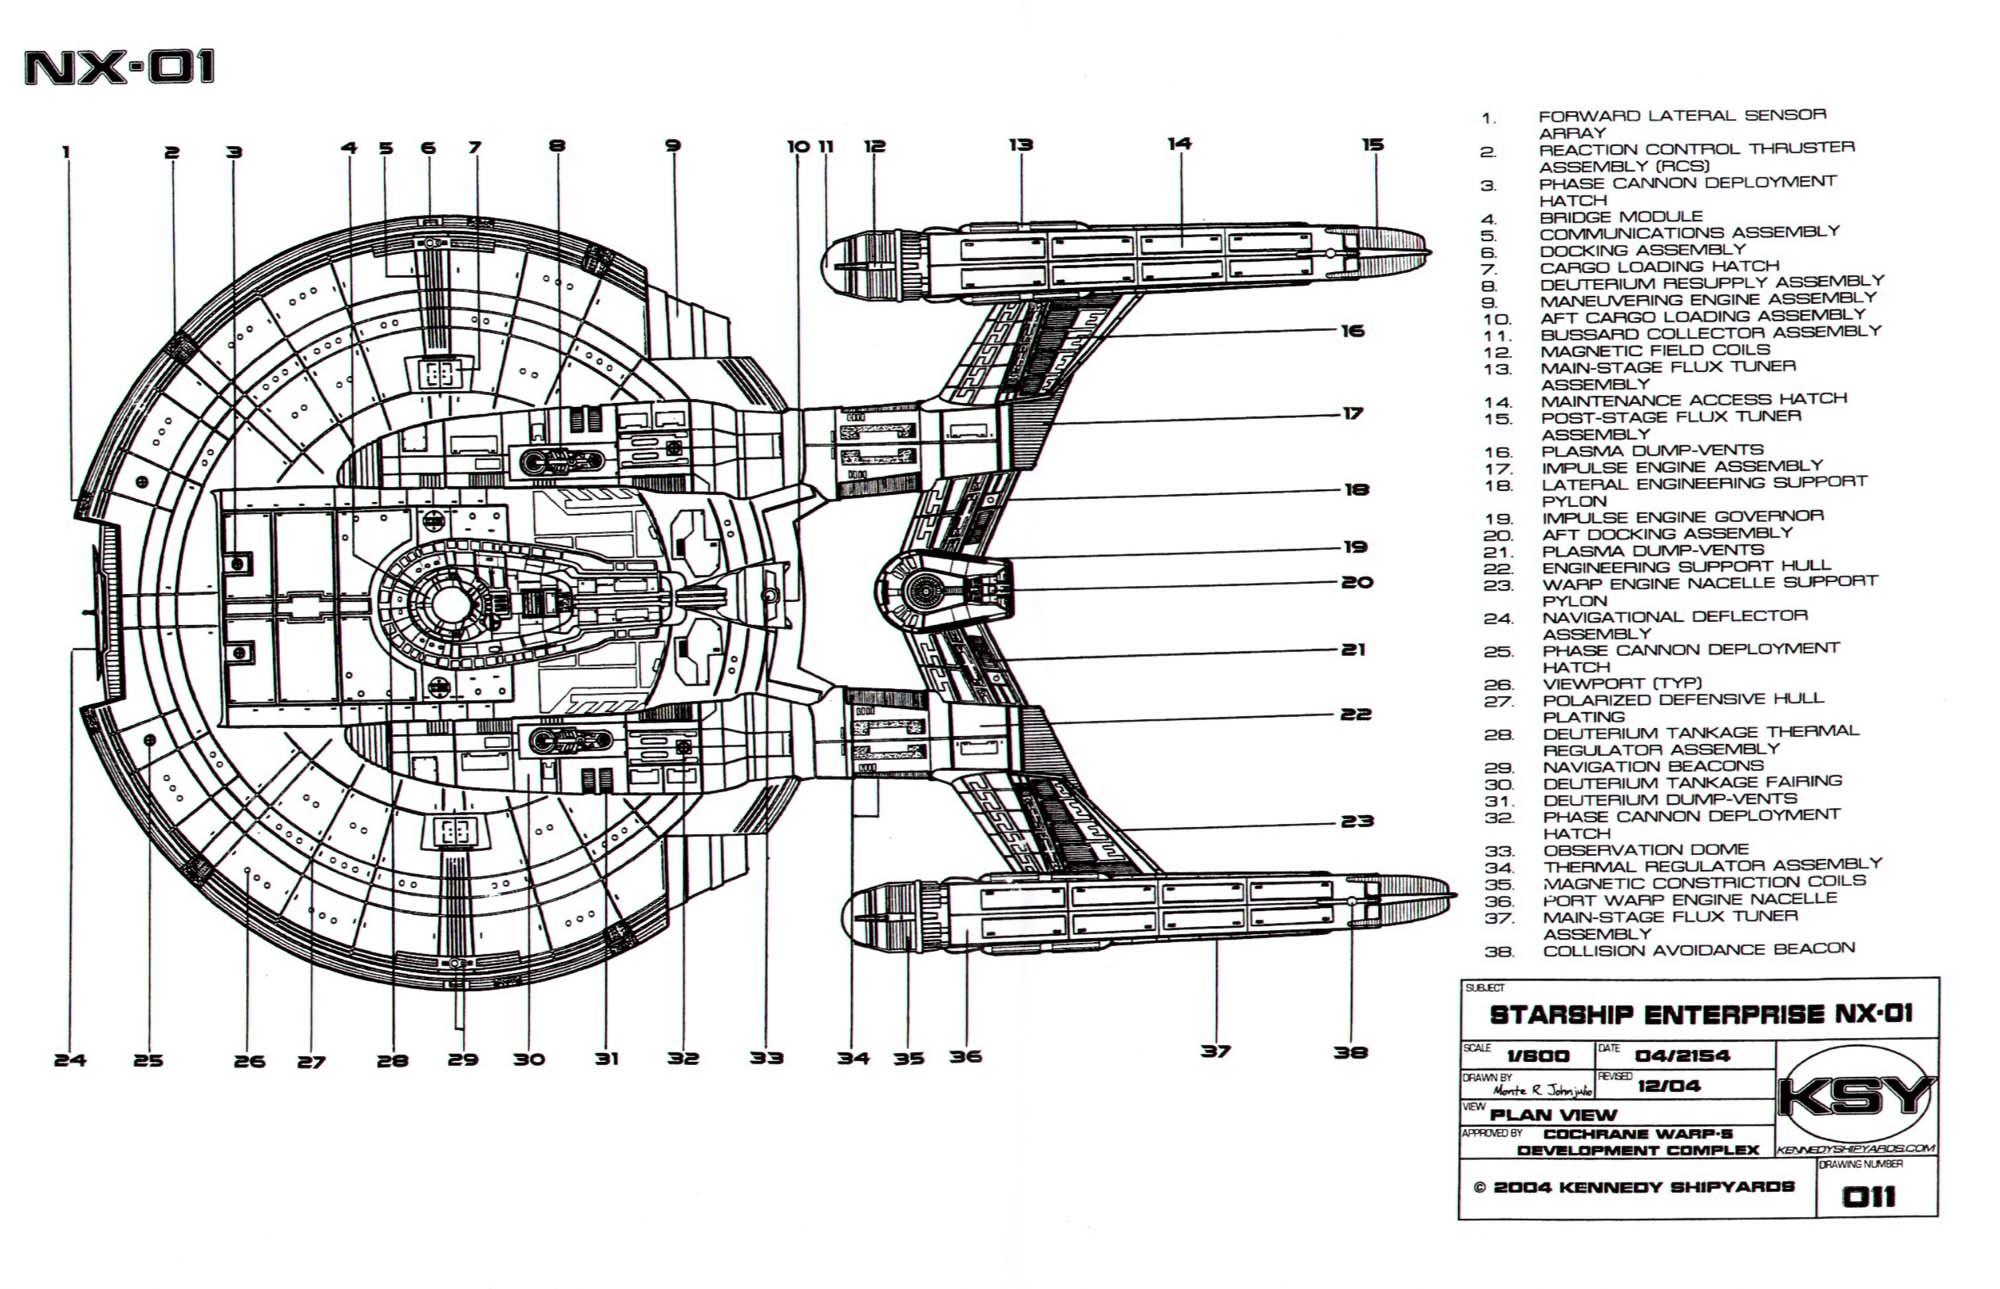 Star trek blueprints starfleet vessel enterprise nx 01 for Decor fusion interior design agency manchester m3